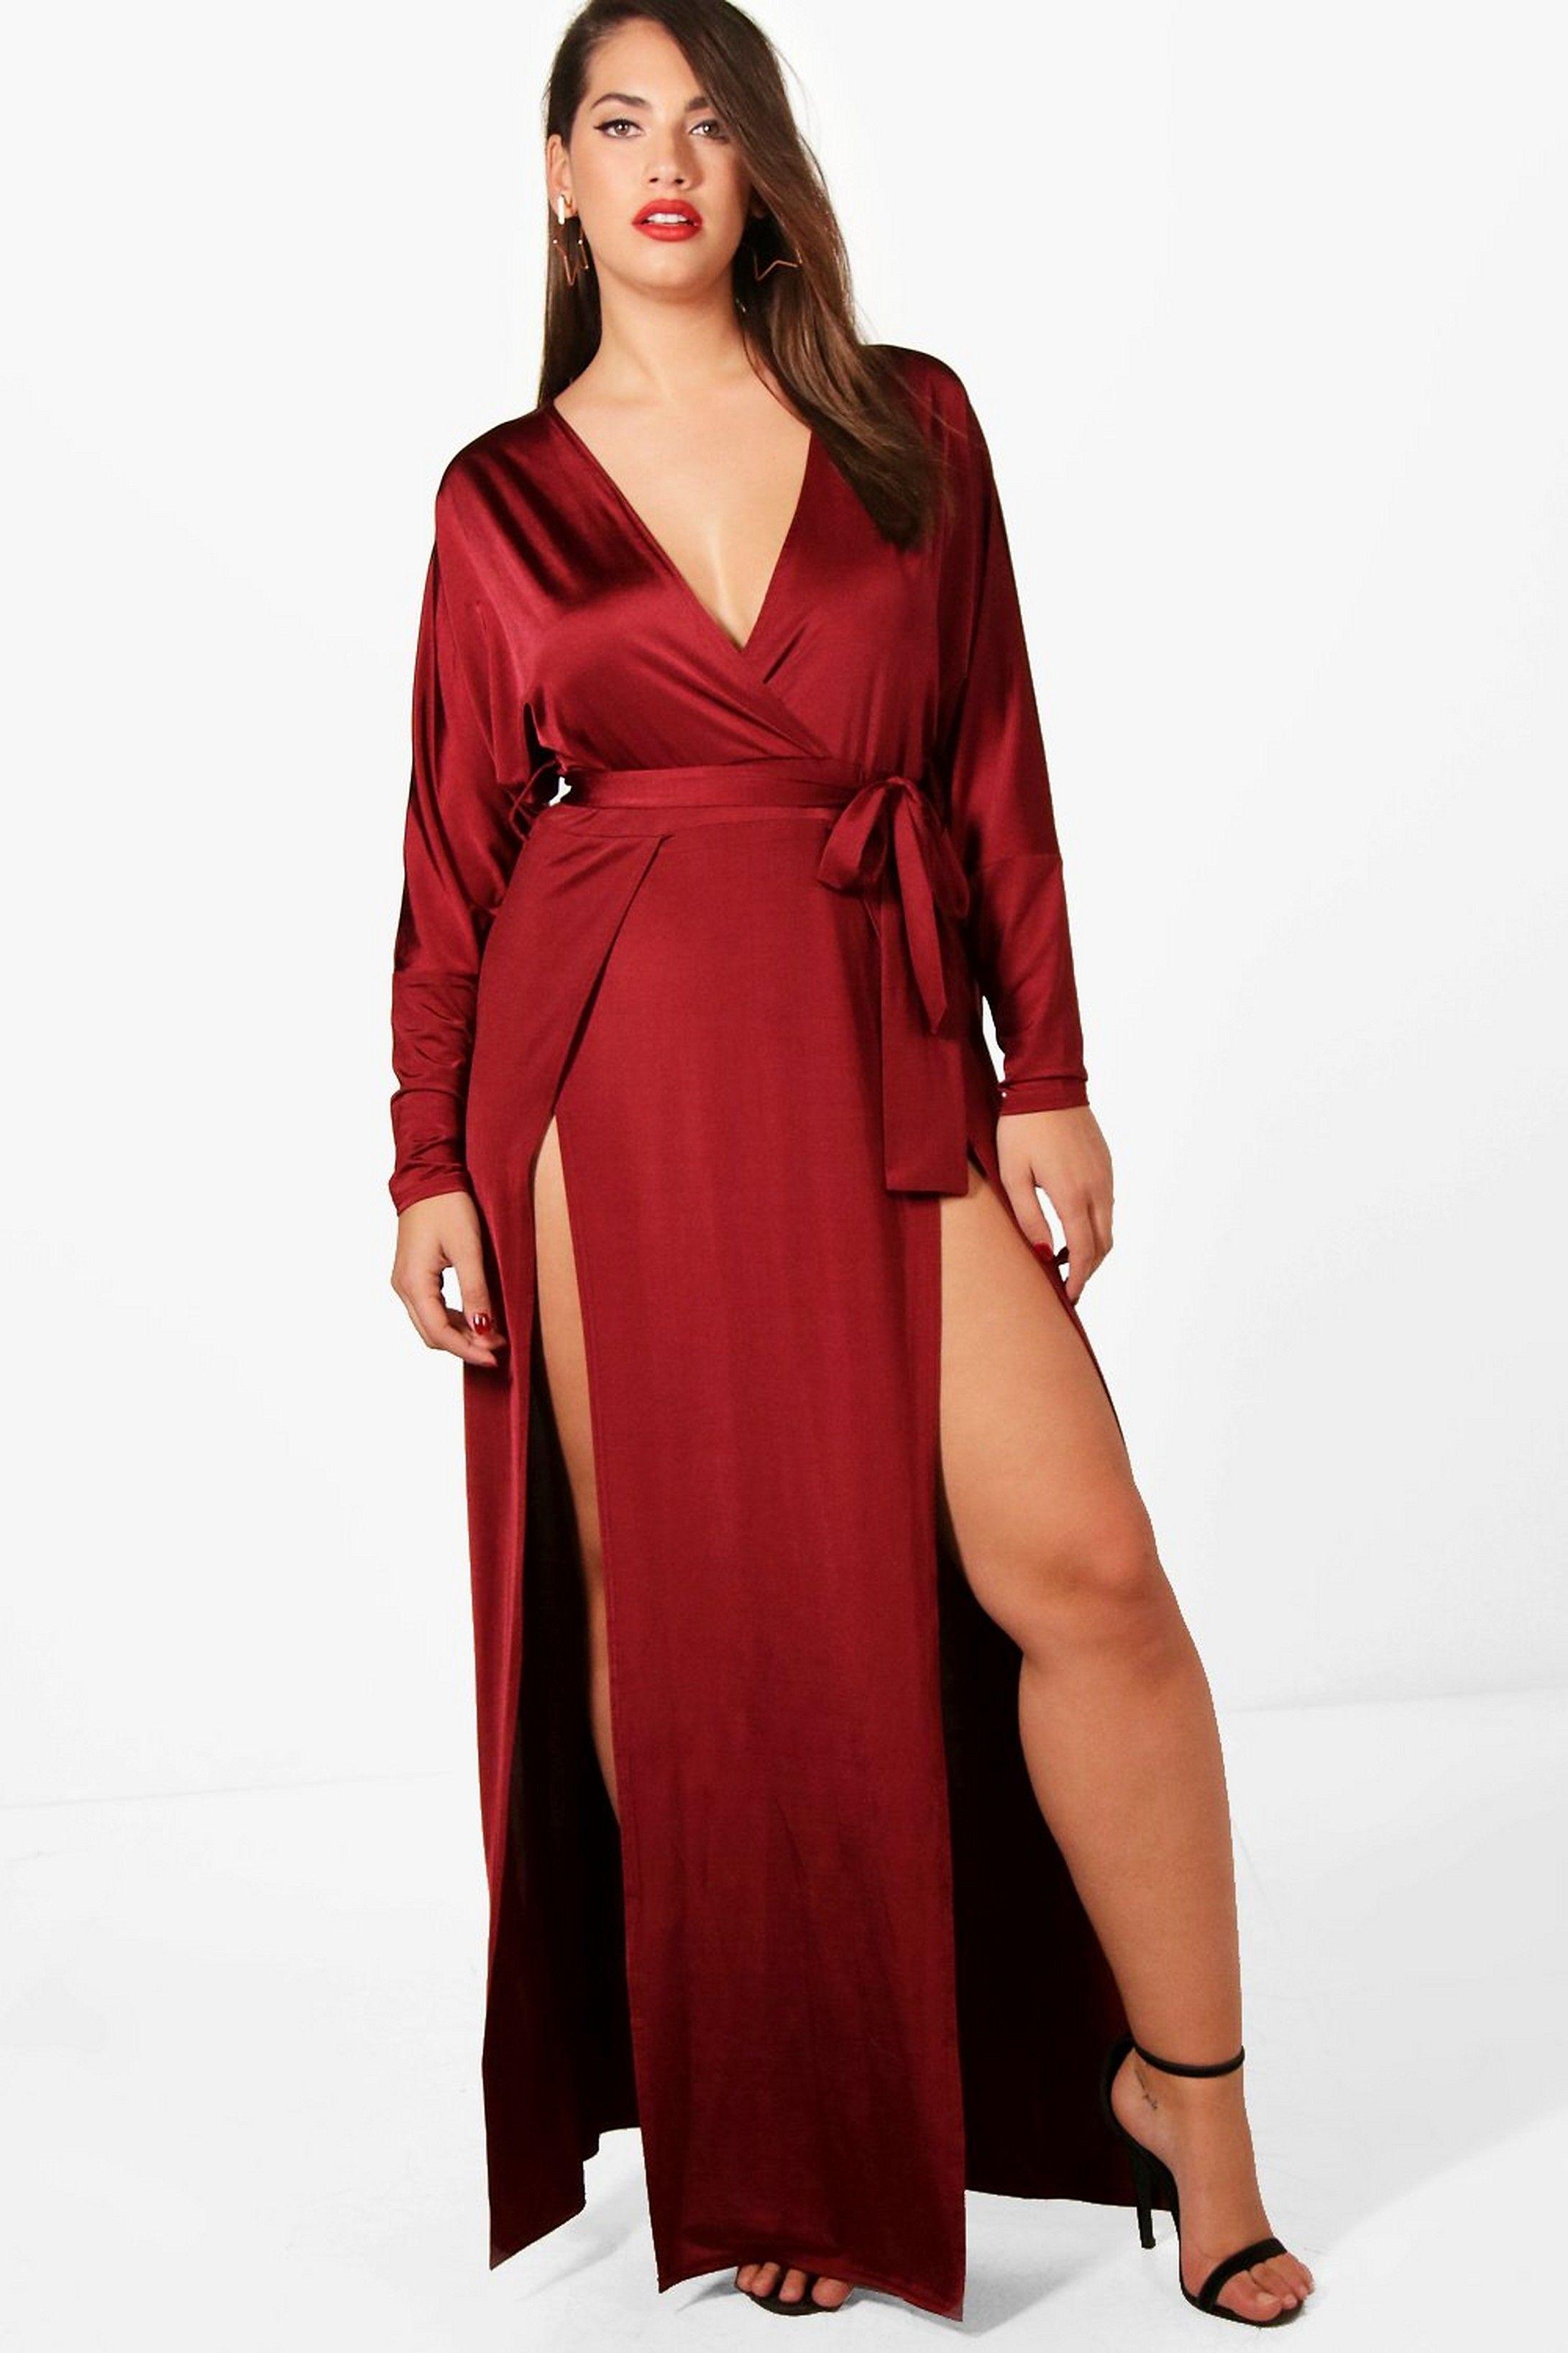 839901ea05 Plus Slinky Plunge Split Maxi Dress in 2019 | Clothing Closet | Plus ...